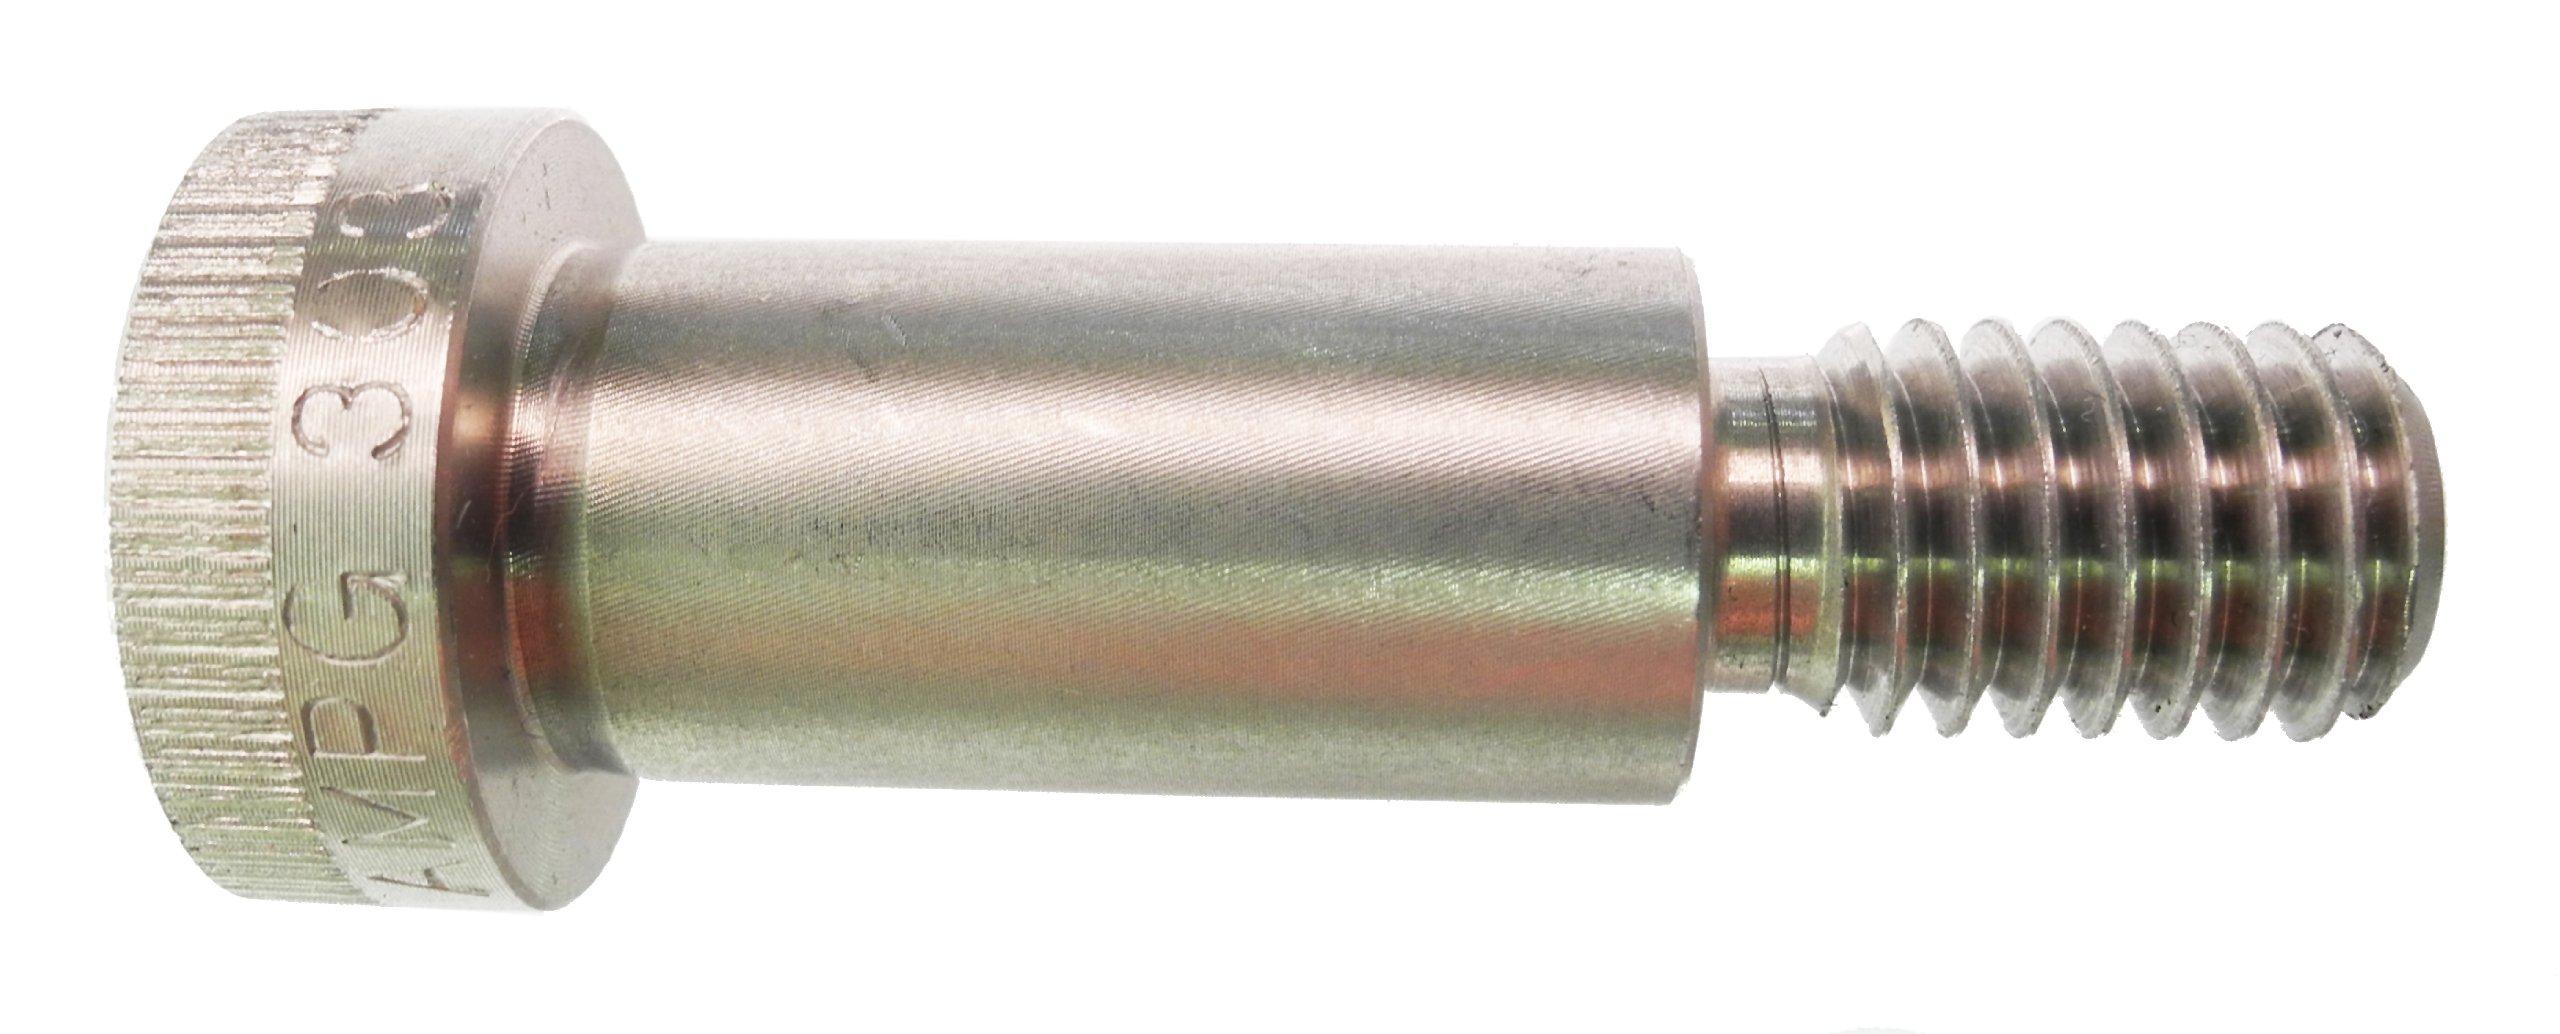 Plain Finish Socket Head Cap Hex Socket Drive 3//16 Thread Length Pack of 1 Standard Tolerance Meets ASME B18.3 5//32 Shoulder Diameter 316 Stainless Steel Shoulder Screw Partially Threaded #6-32 Threads 1//2 Shoulder Length Made in US,